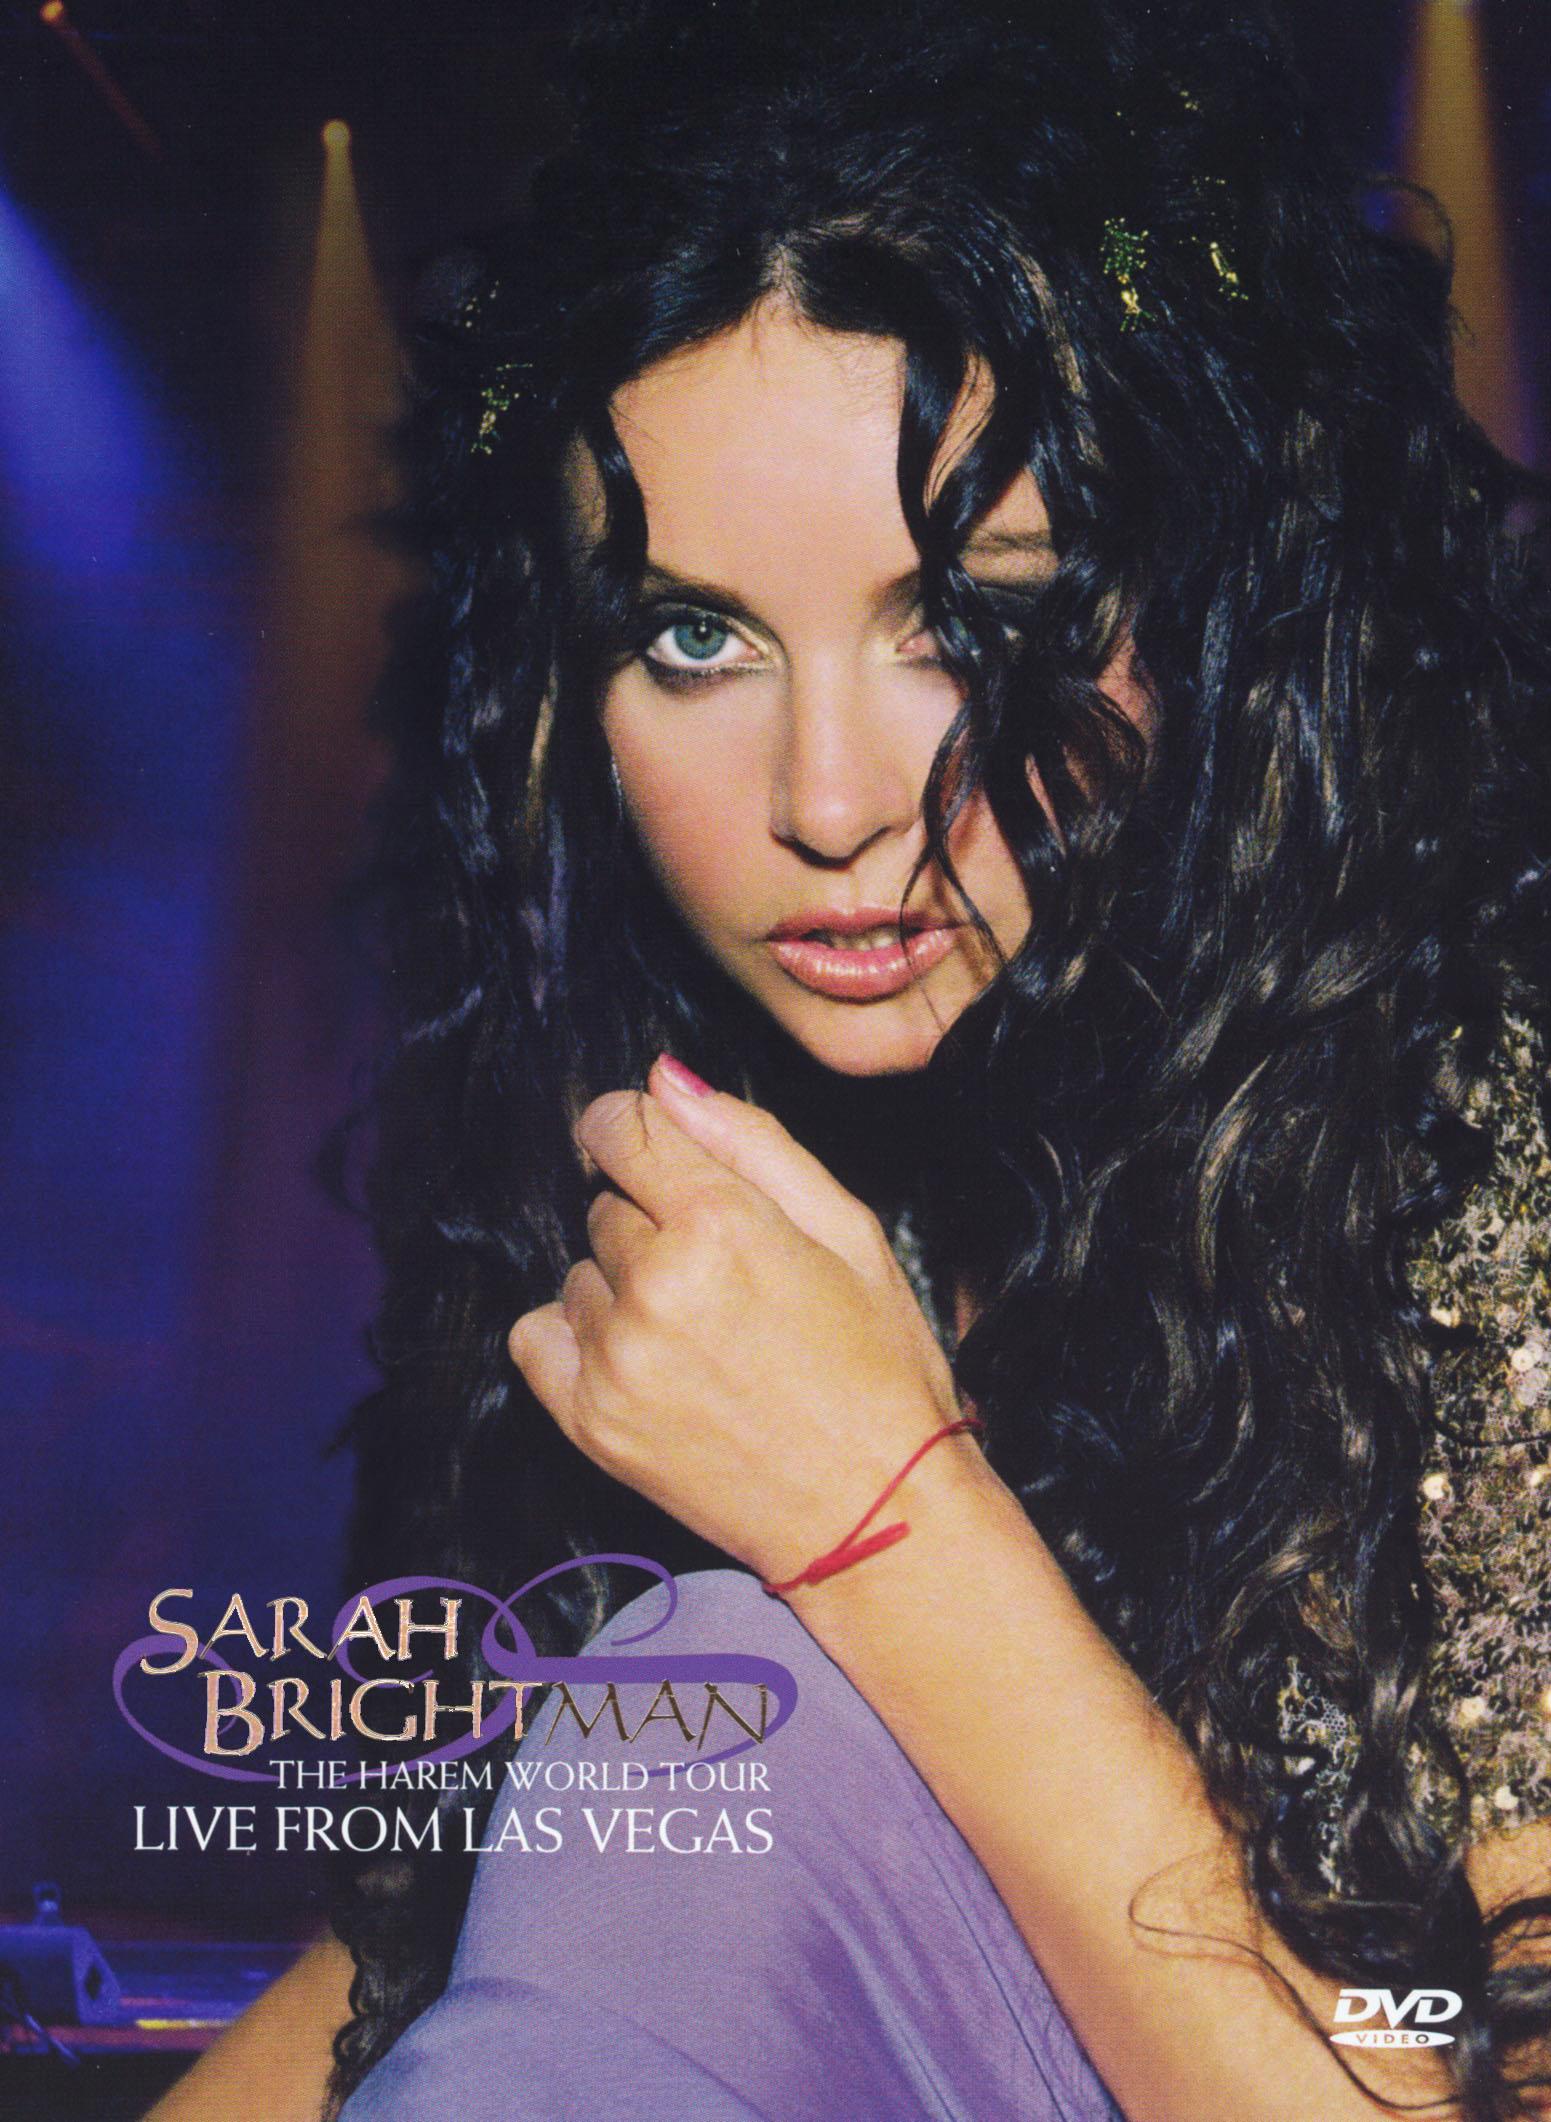 Sarah Brightman: The Harem World Tour - Live From Las Vegas